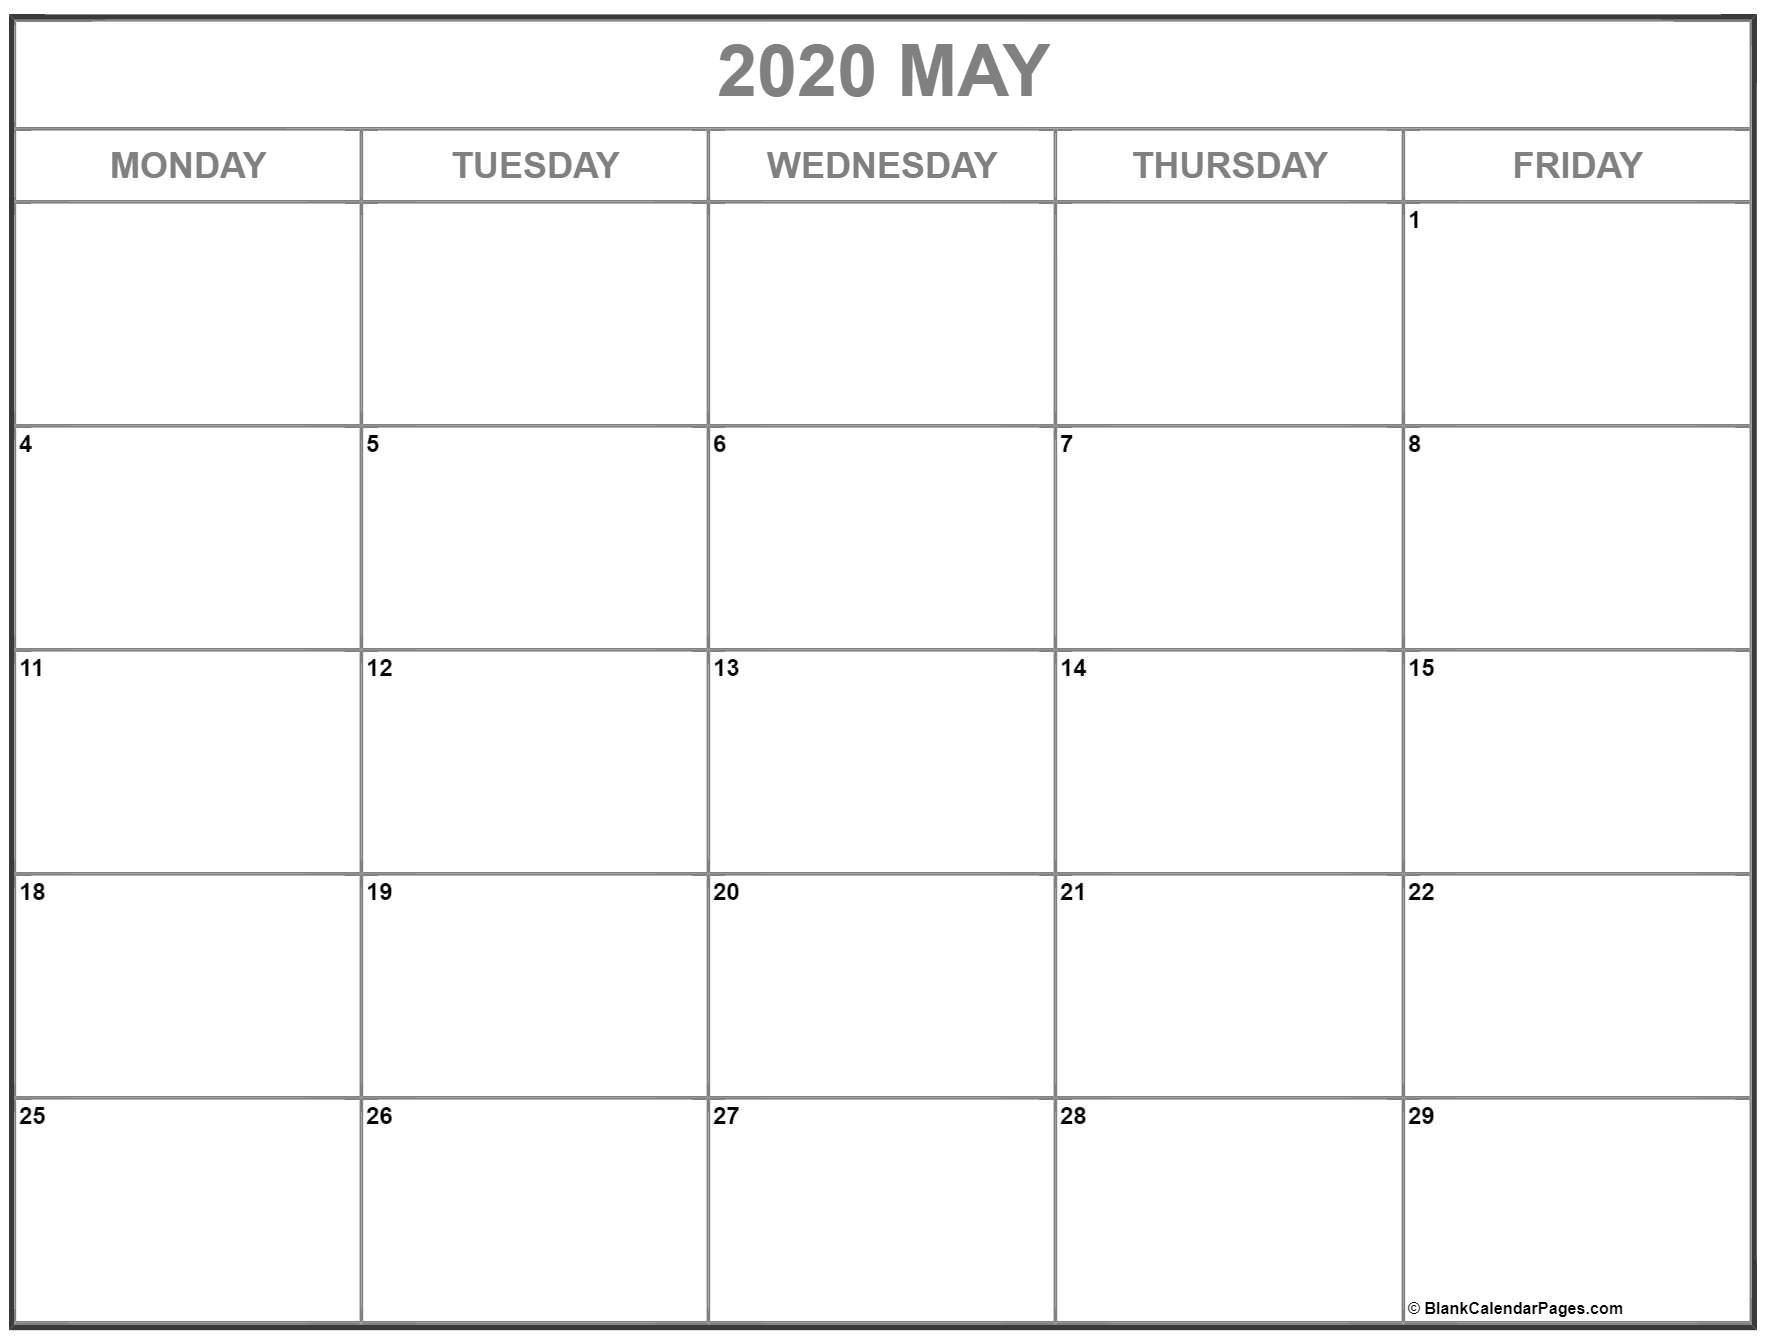 May 2020 Monday Calendar   Monday To Sunday Free Printable Monday Friday Calendar